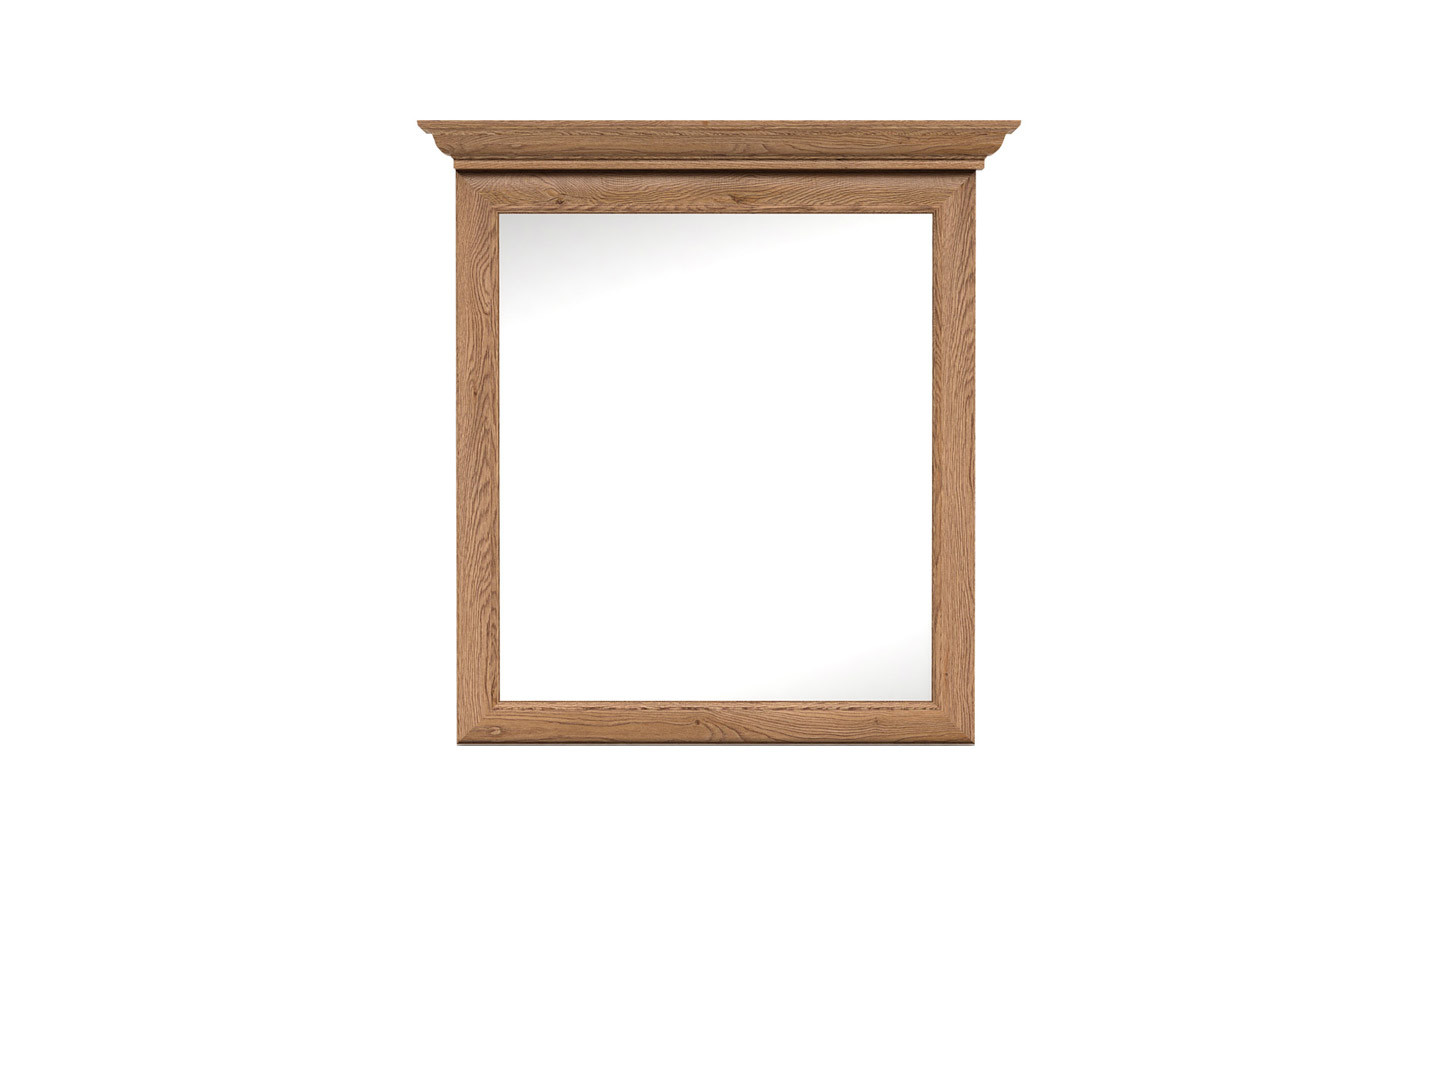 Zrkadlo KENT ELUS 102 dub amsterdam